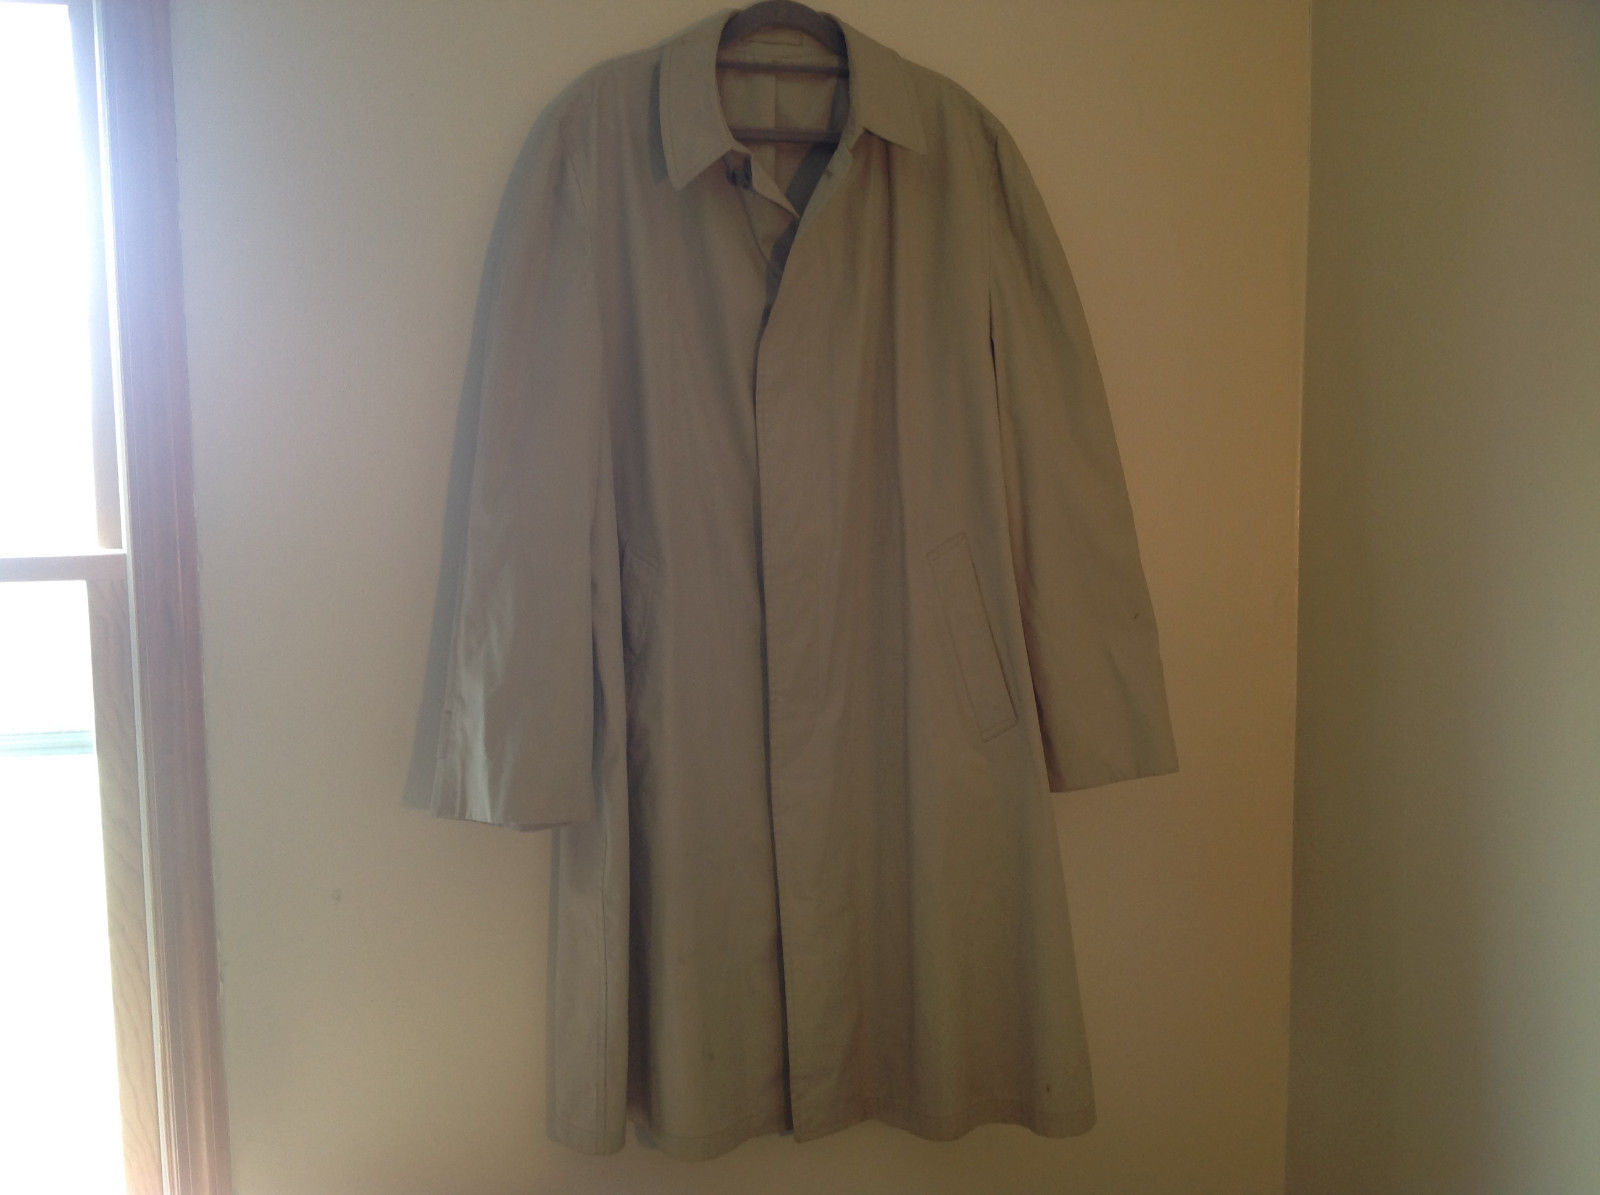 London Fog Main Coats Khaki Water Repelling Raincoat Trenchcoat Size 44 Long